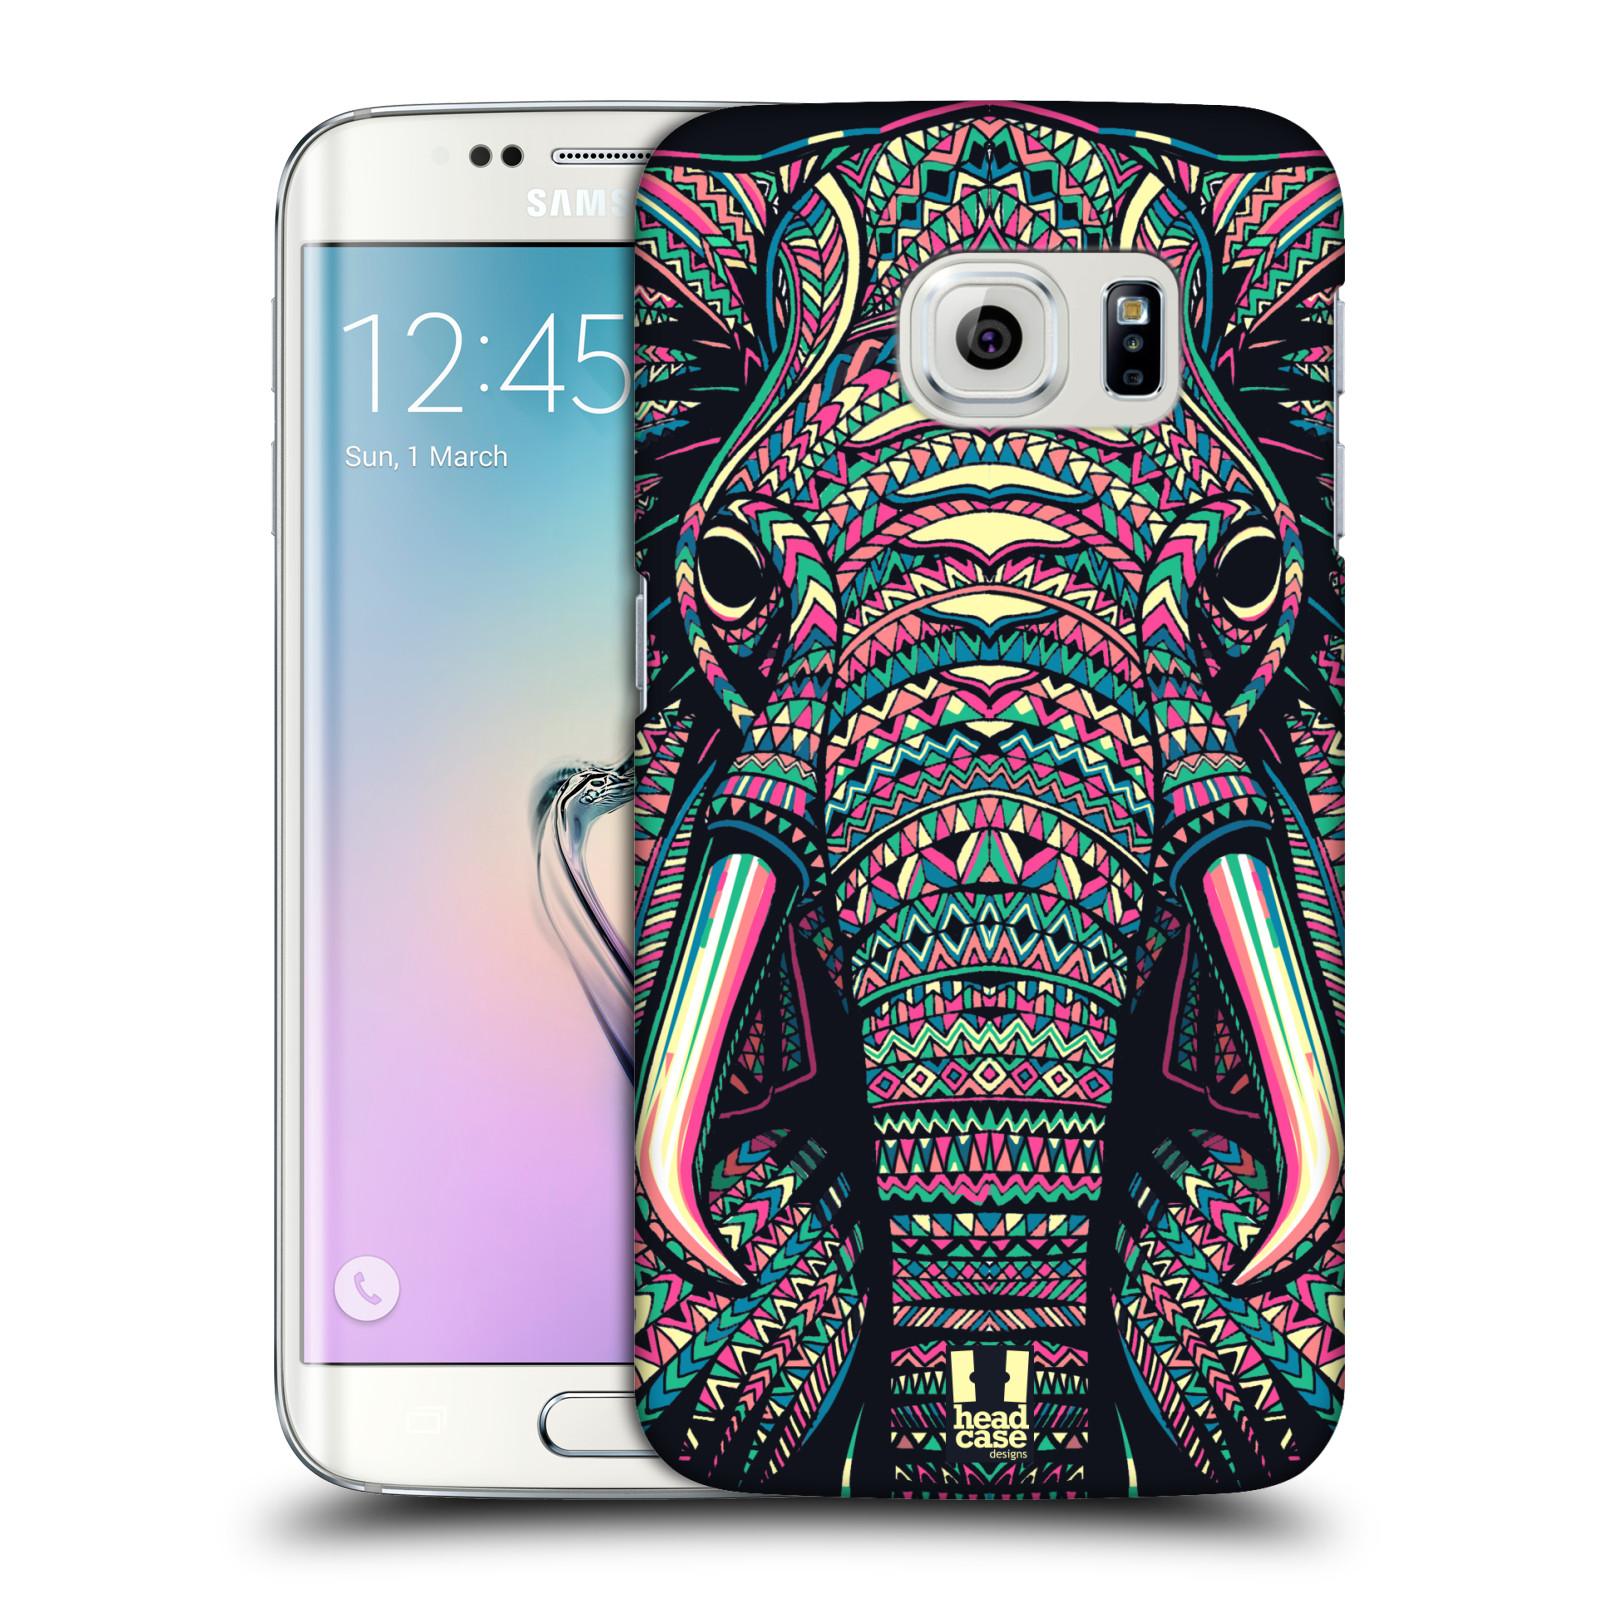 HEAD CASE plastový obal na mobil SAMSUNG Galaxy S6 EDGE (G9250, G925, G925F) vzor Aztécký motiv zvíře 2 slon